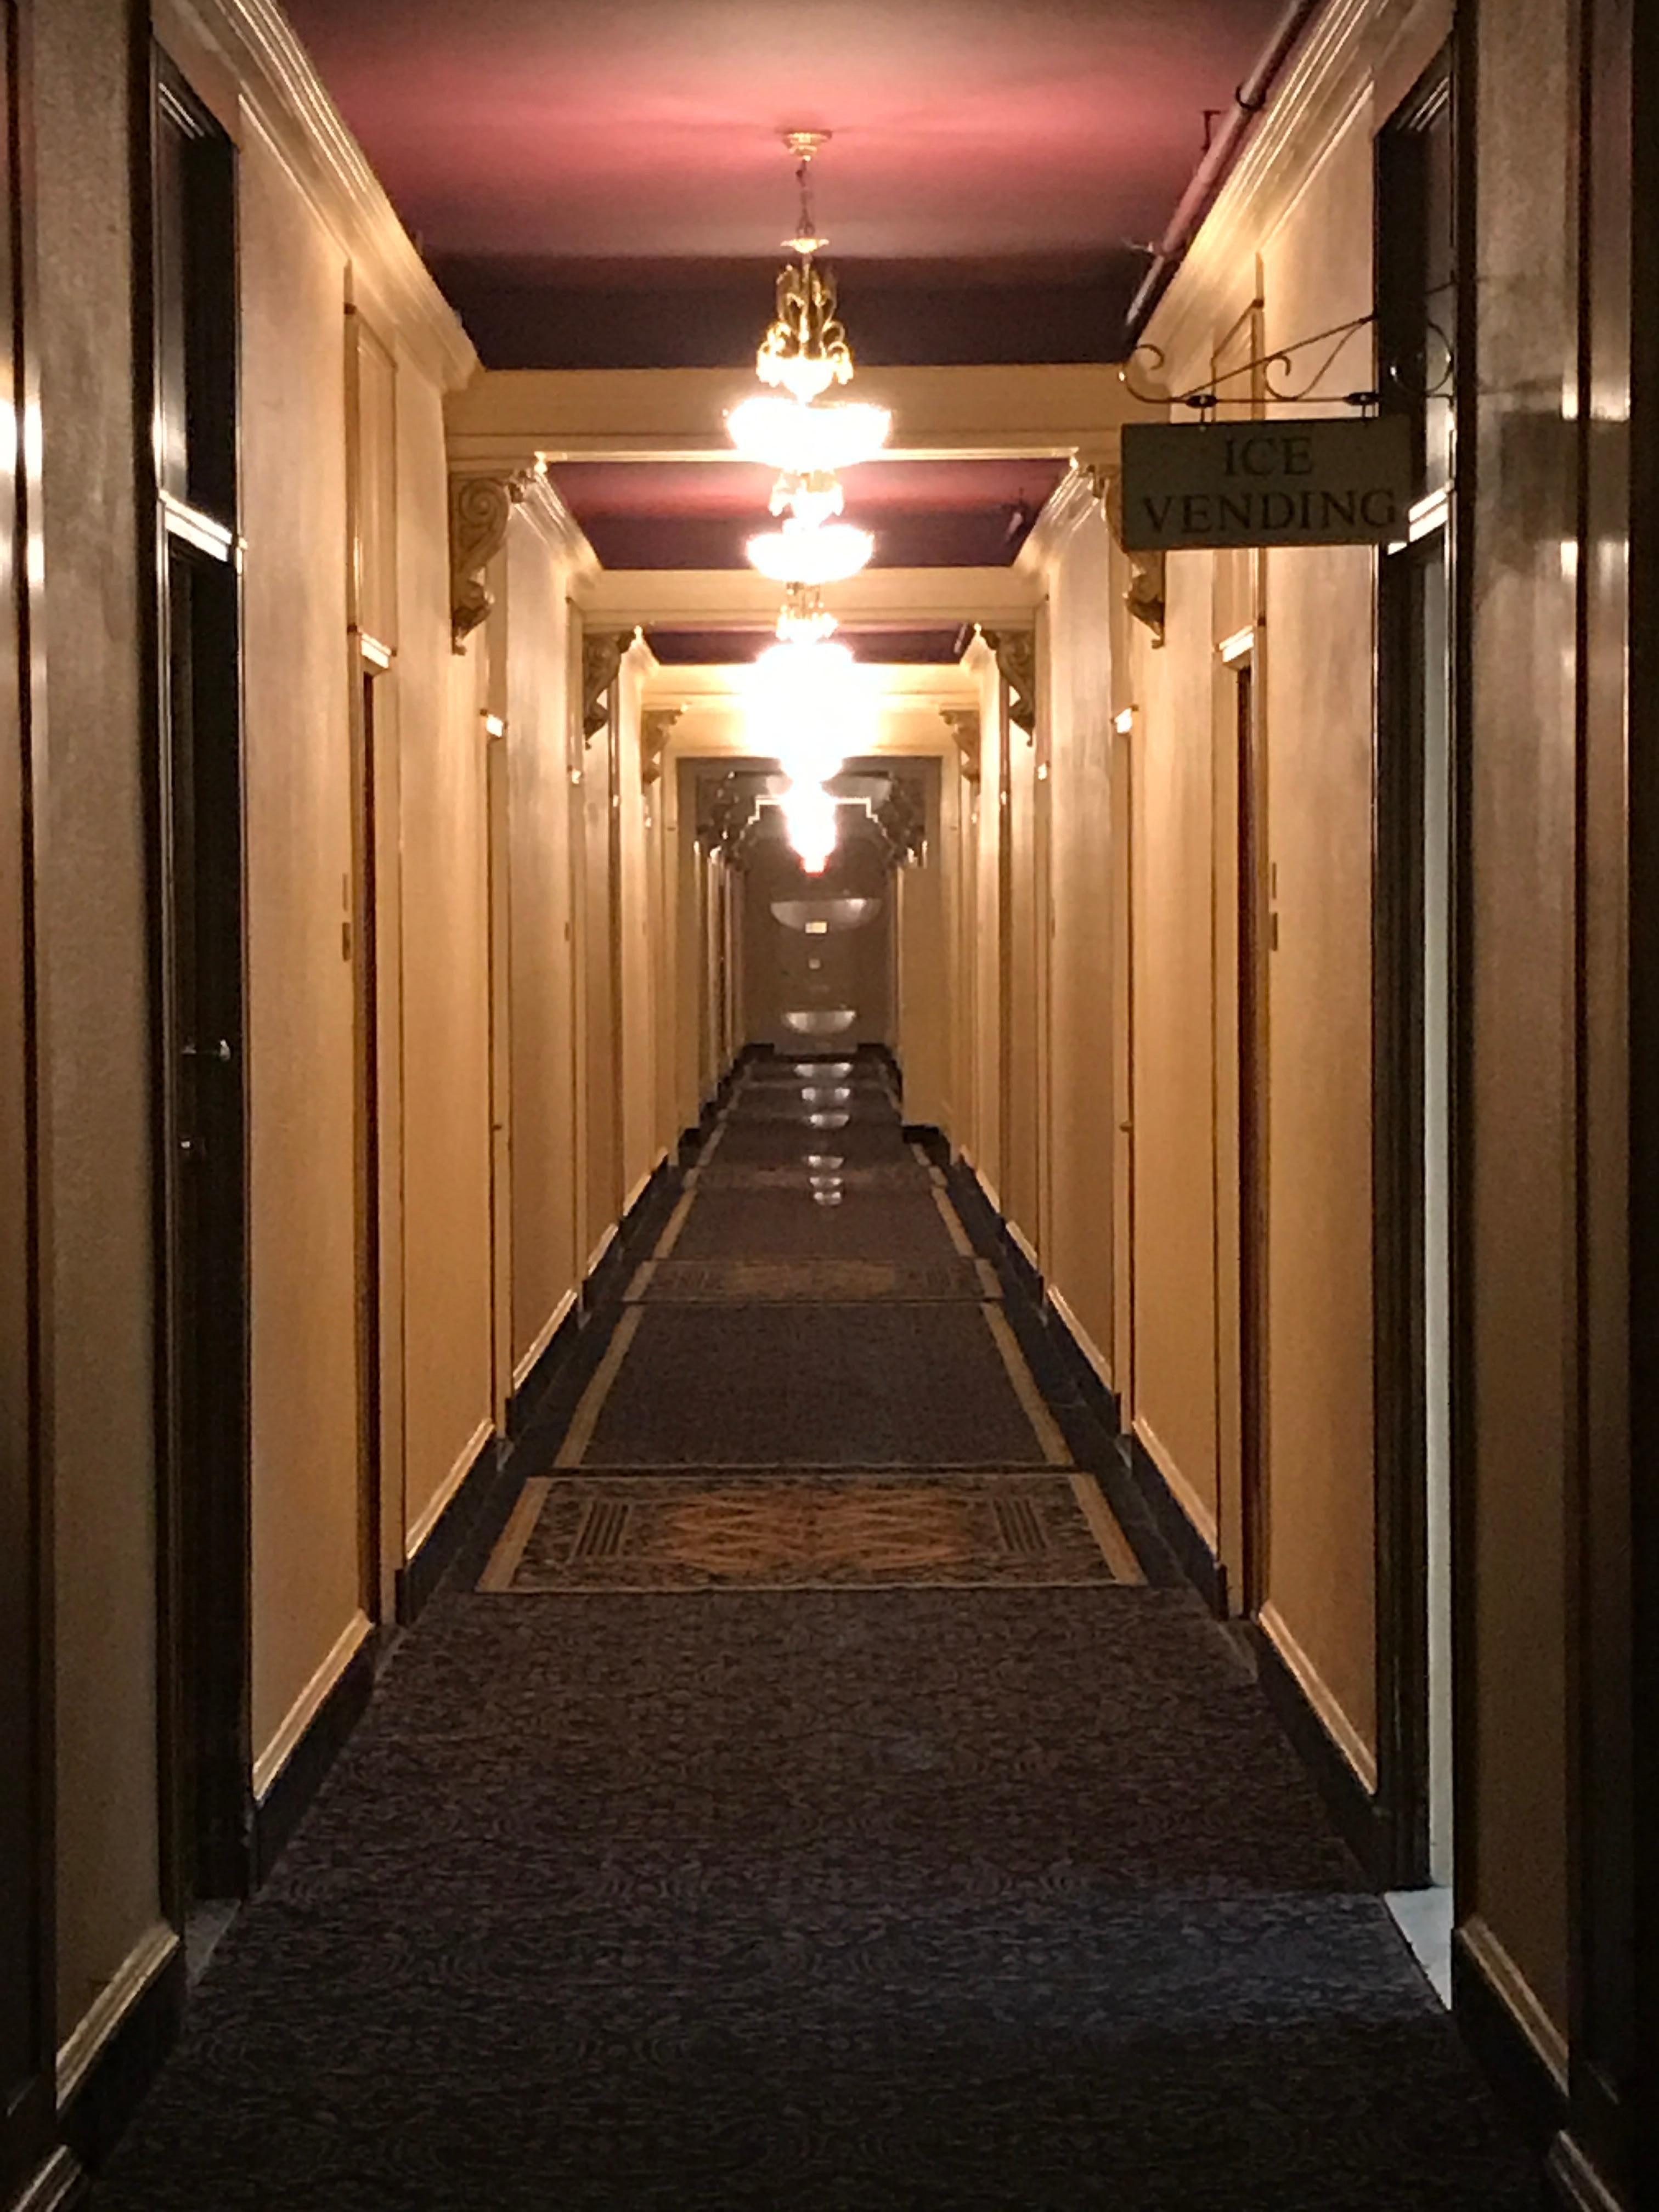 Cool hallways